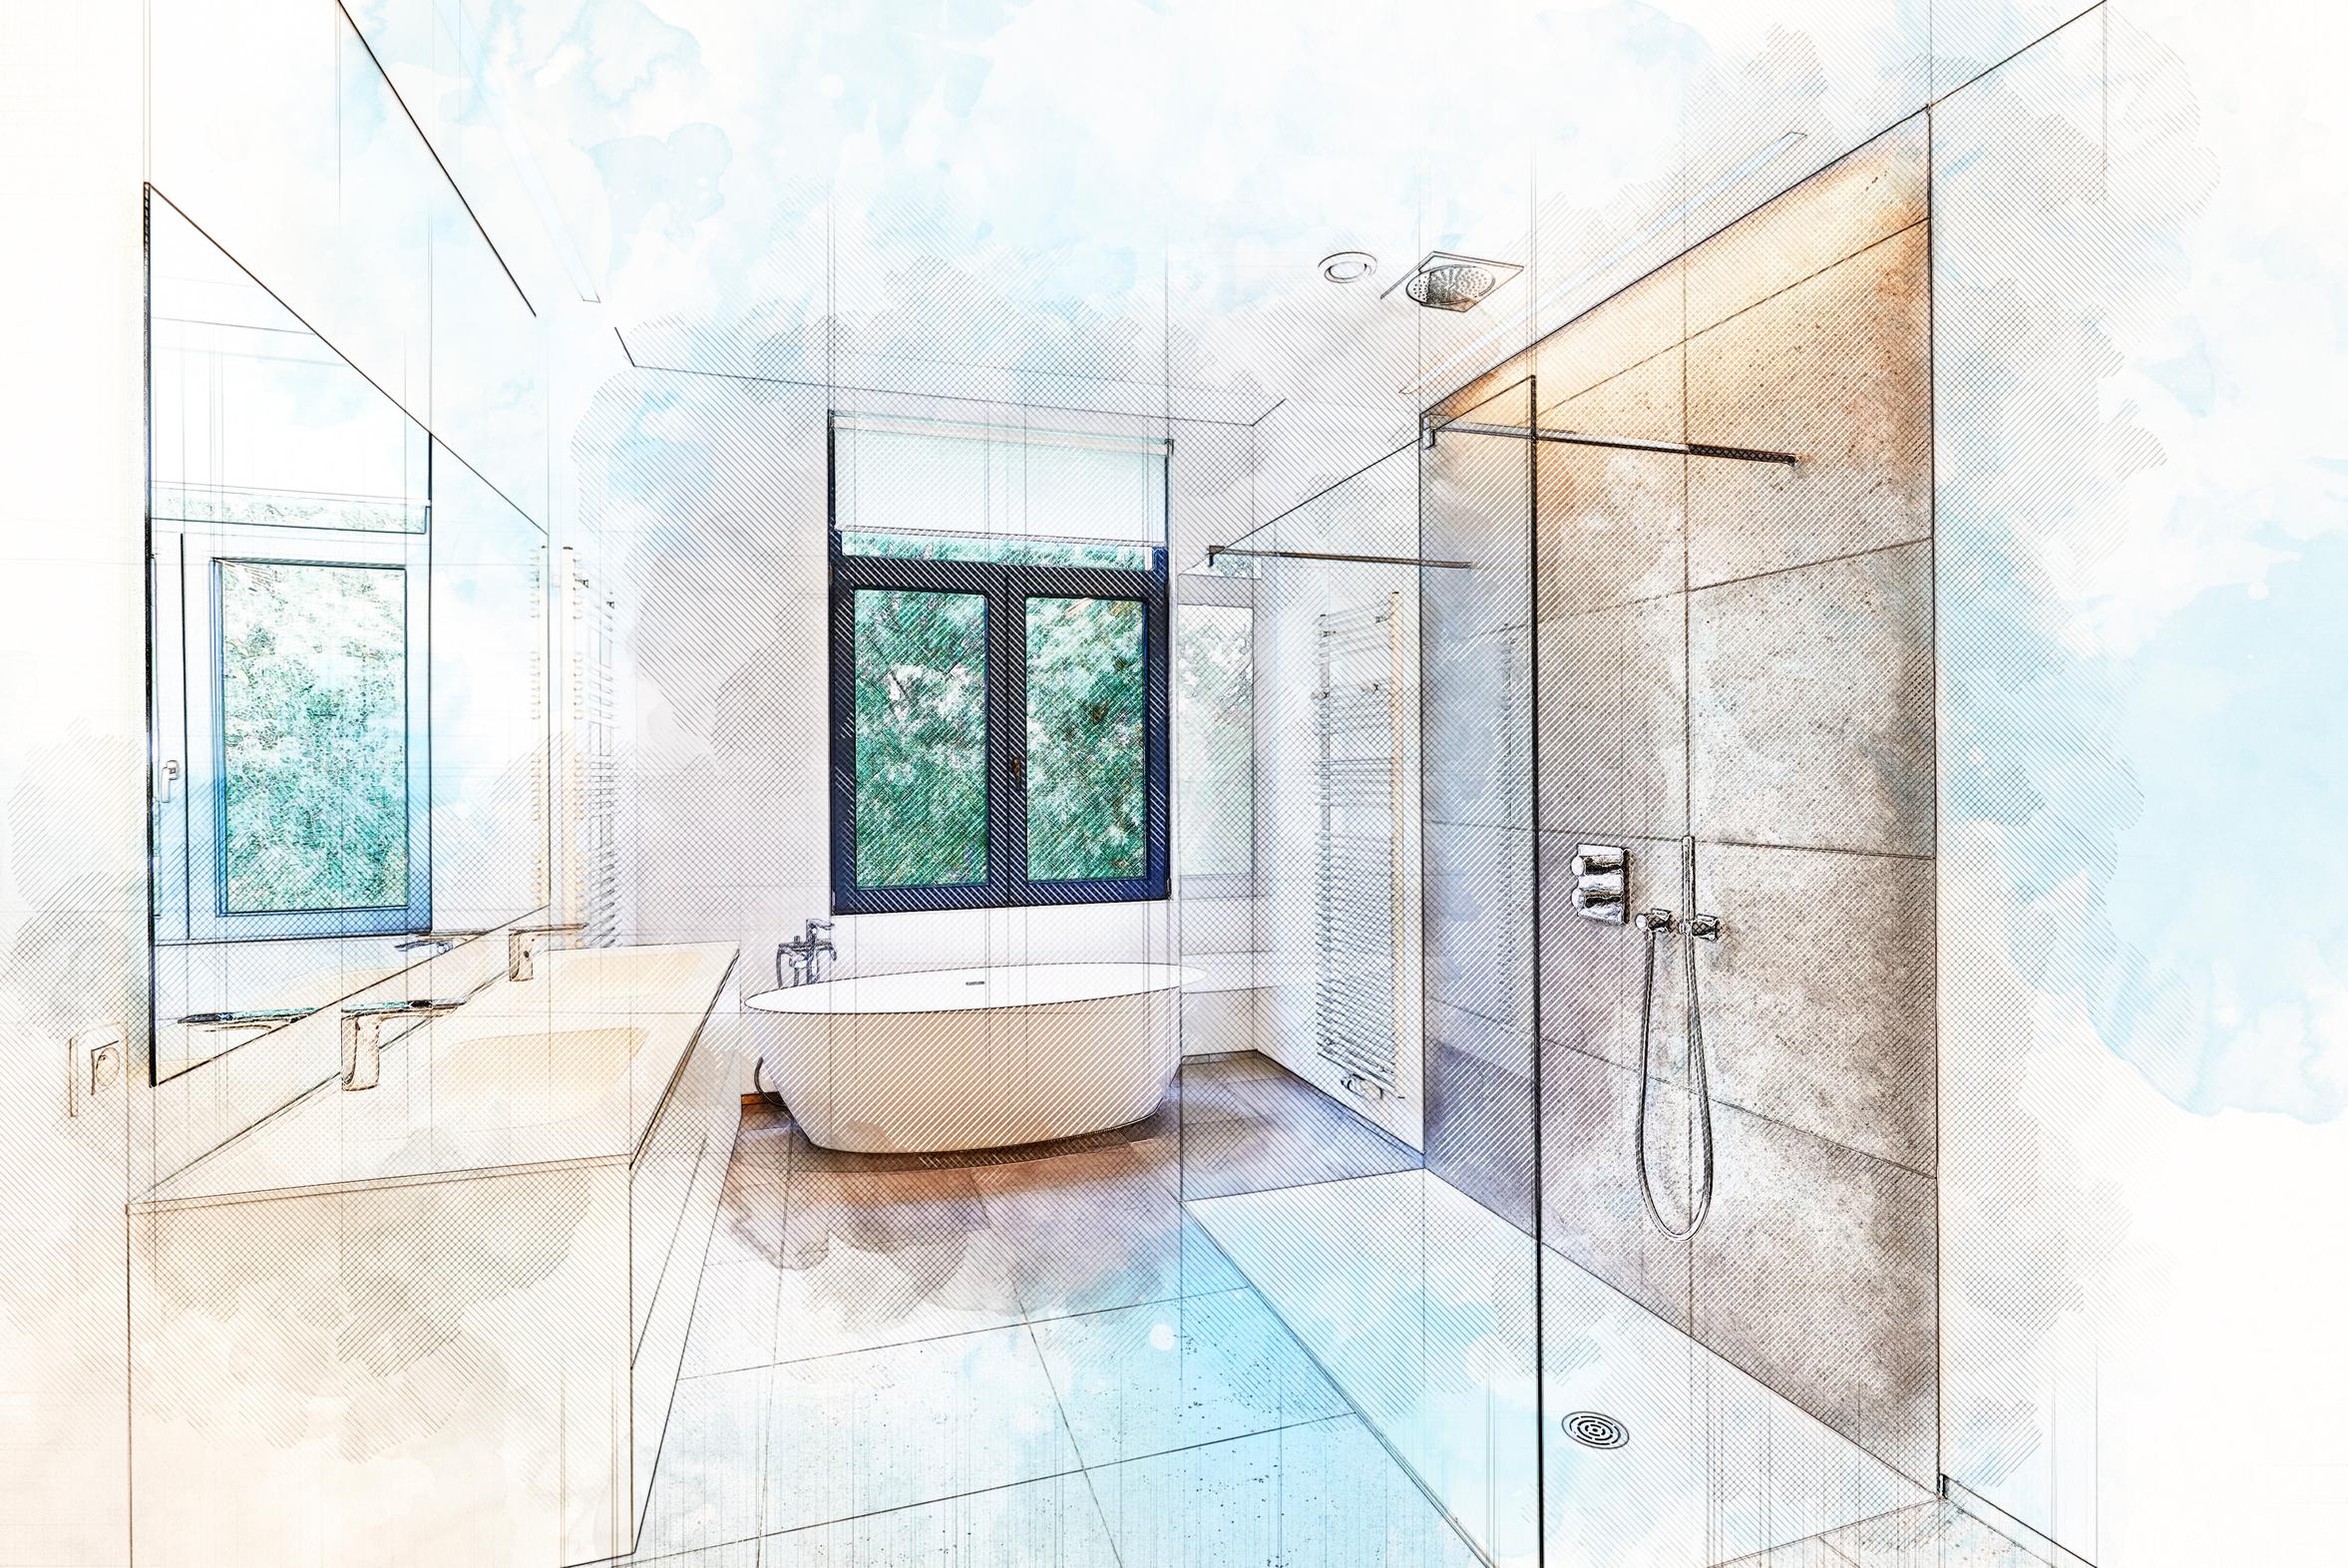 Fabrication de salle de bain sur mesure